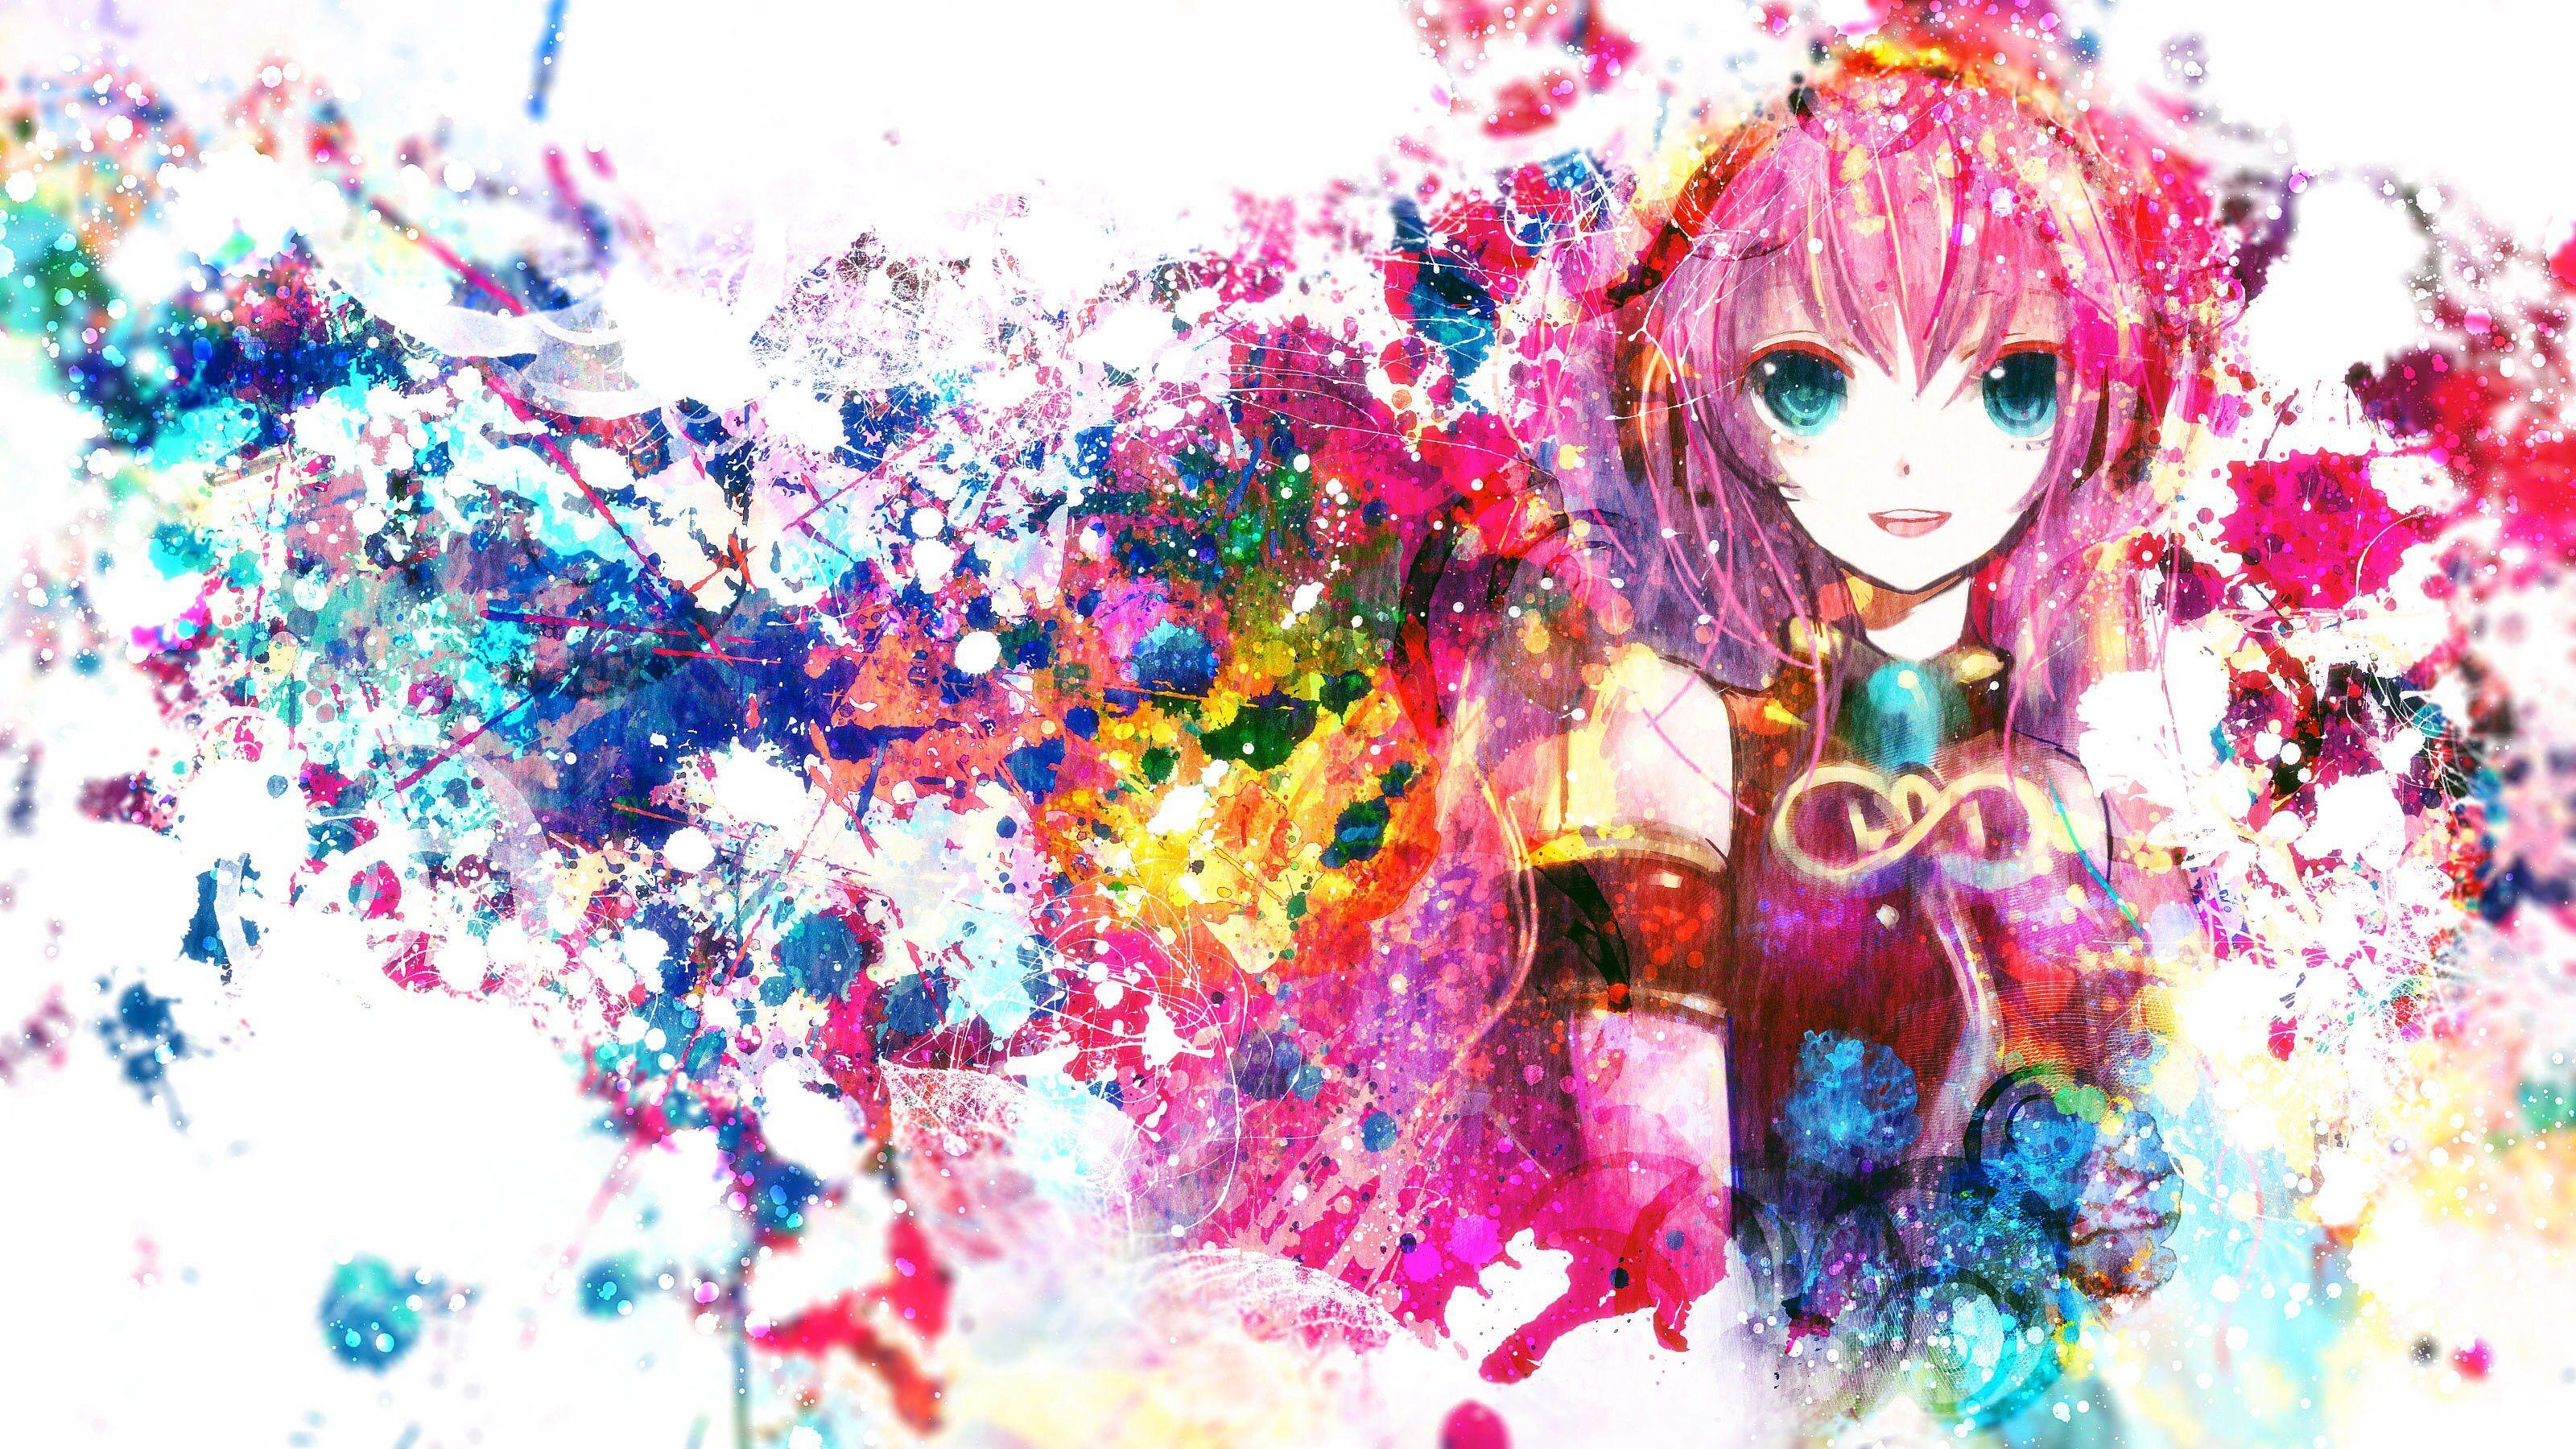 Anime Wallpapers Anime Wallpaper Anime Art Vocaloid Download wallpaper anime graffiti